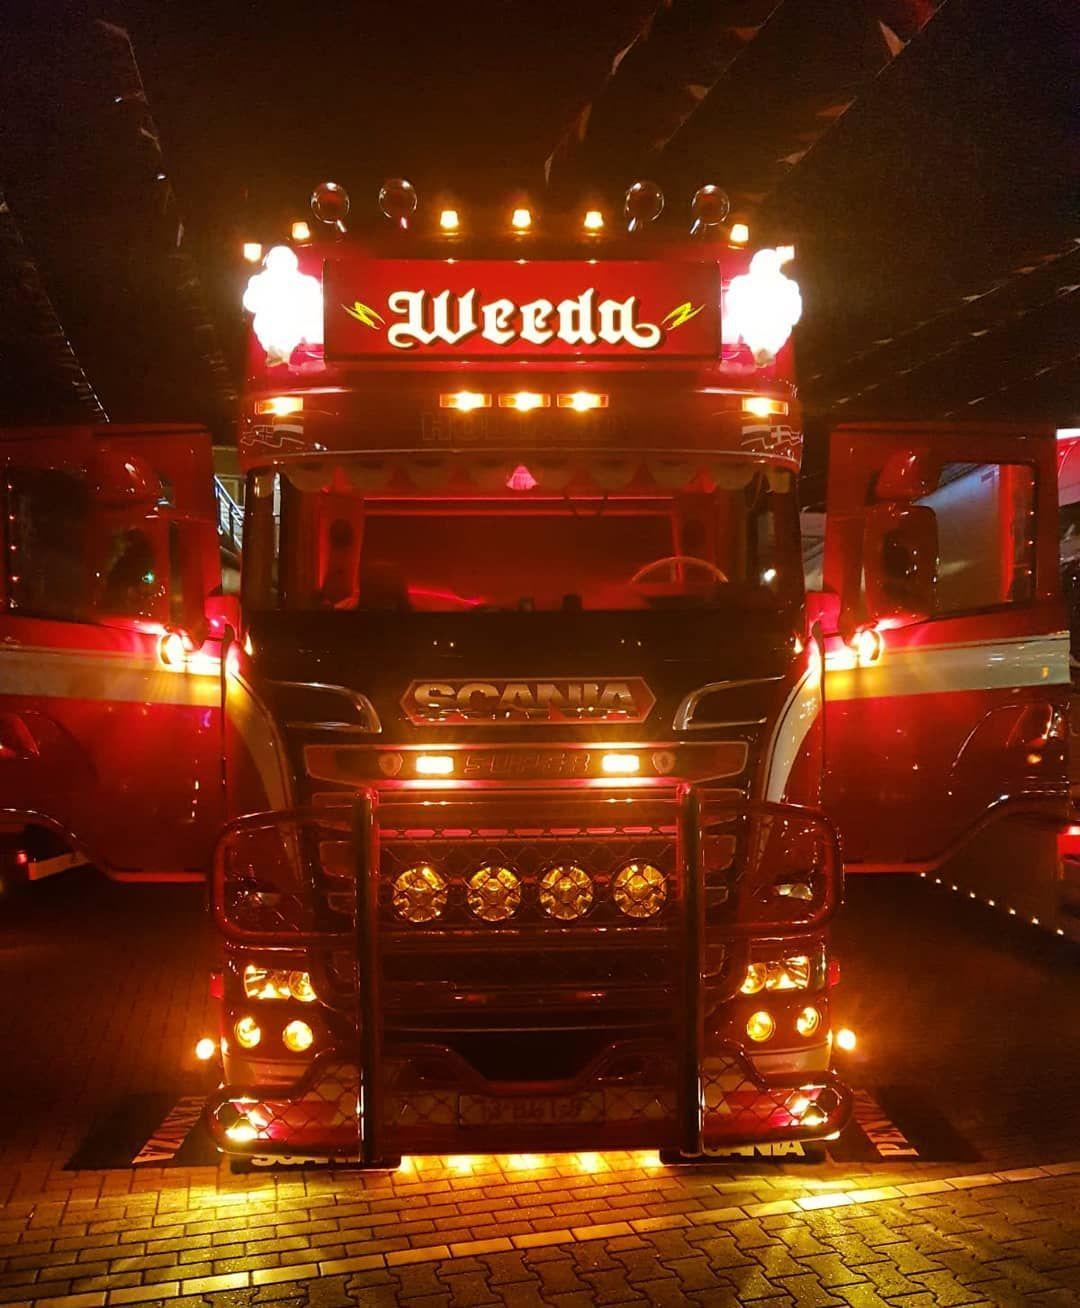 Pin Von Scaniaroadking Auf Trucks And Buses Trucks Scania V8 Lkw